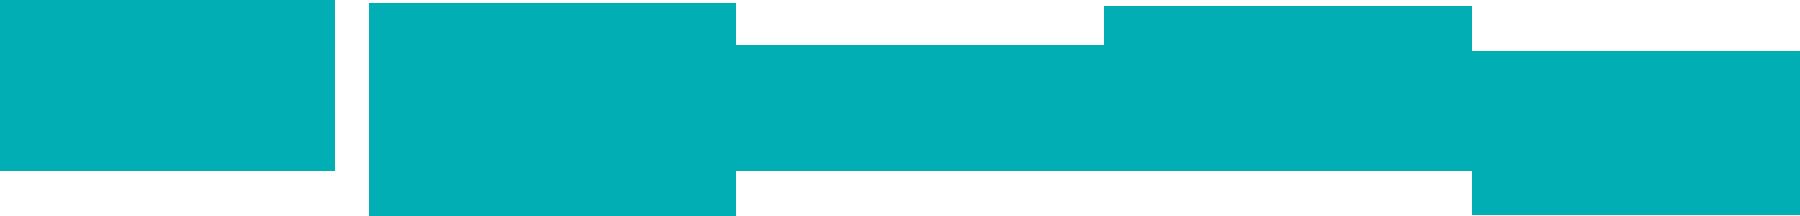 The Improve Group logo